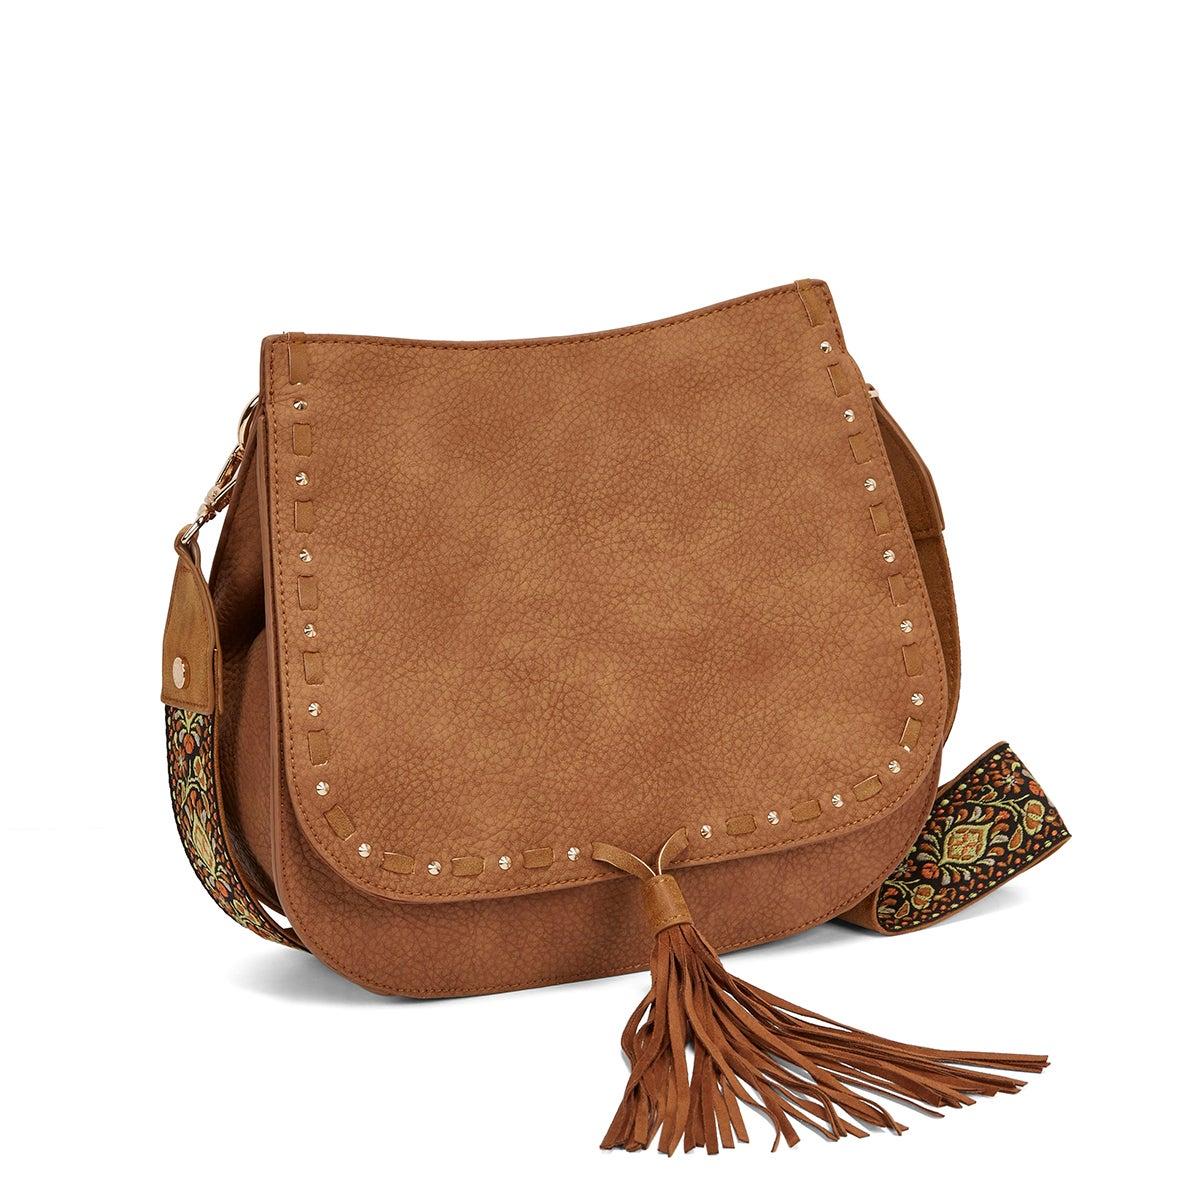 Lds BSwiss tan tassel saddle bag